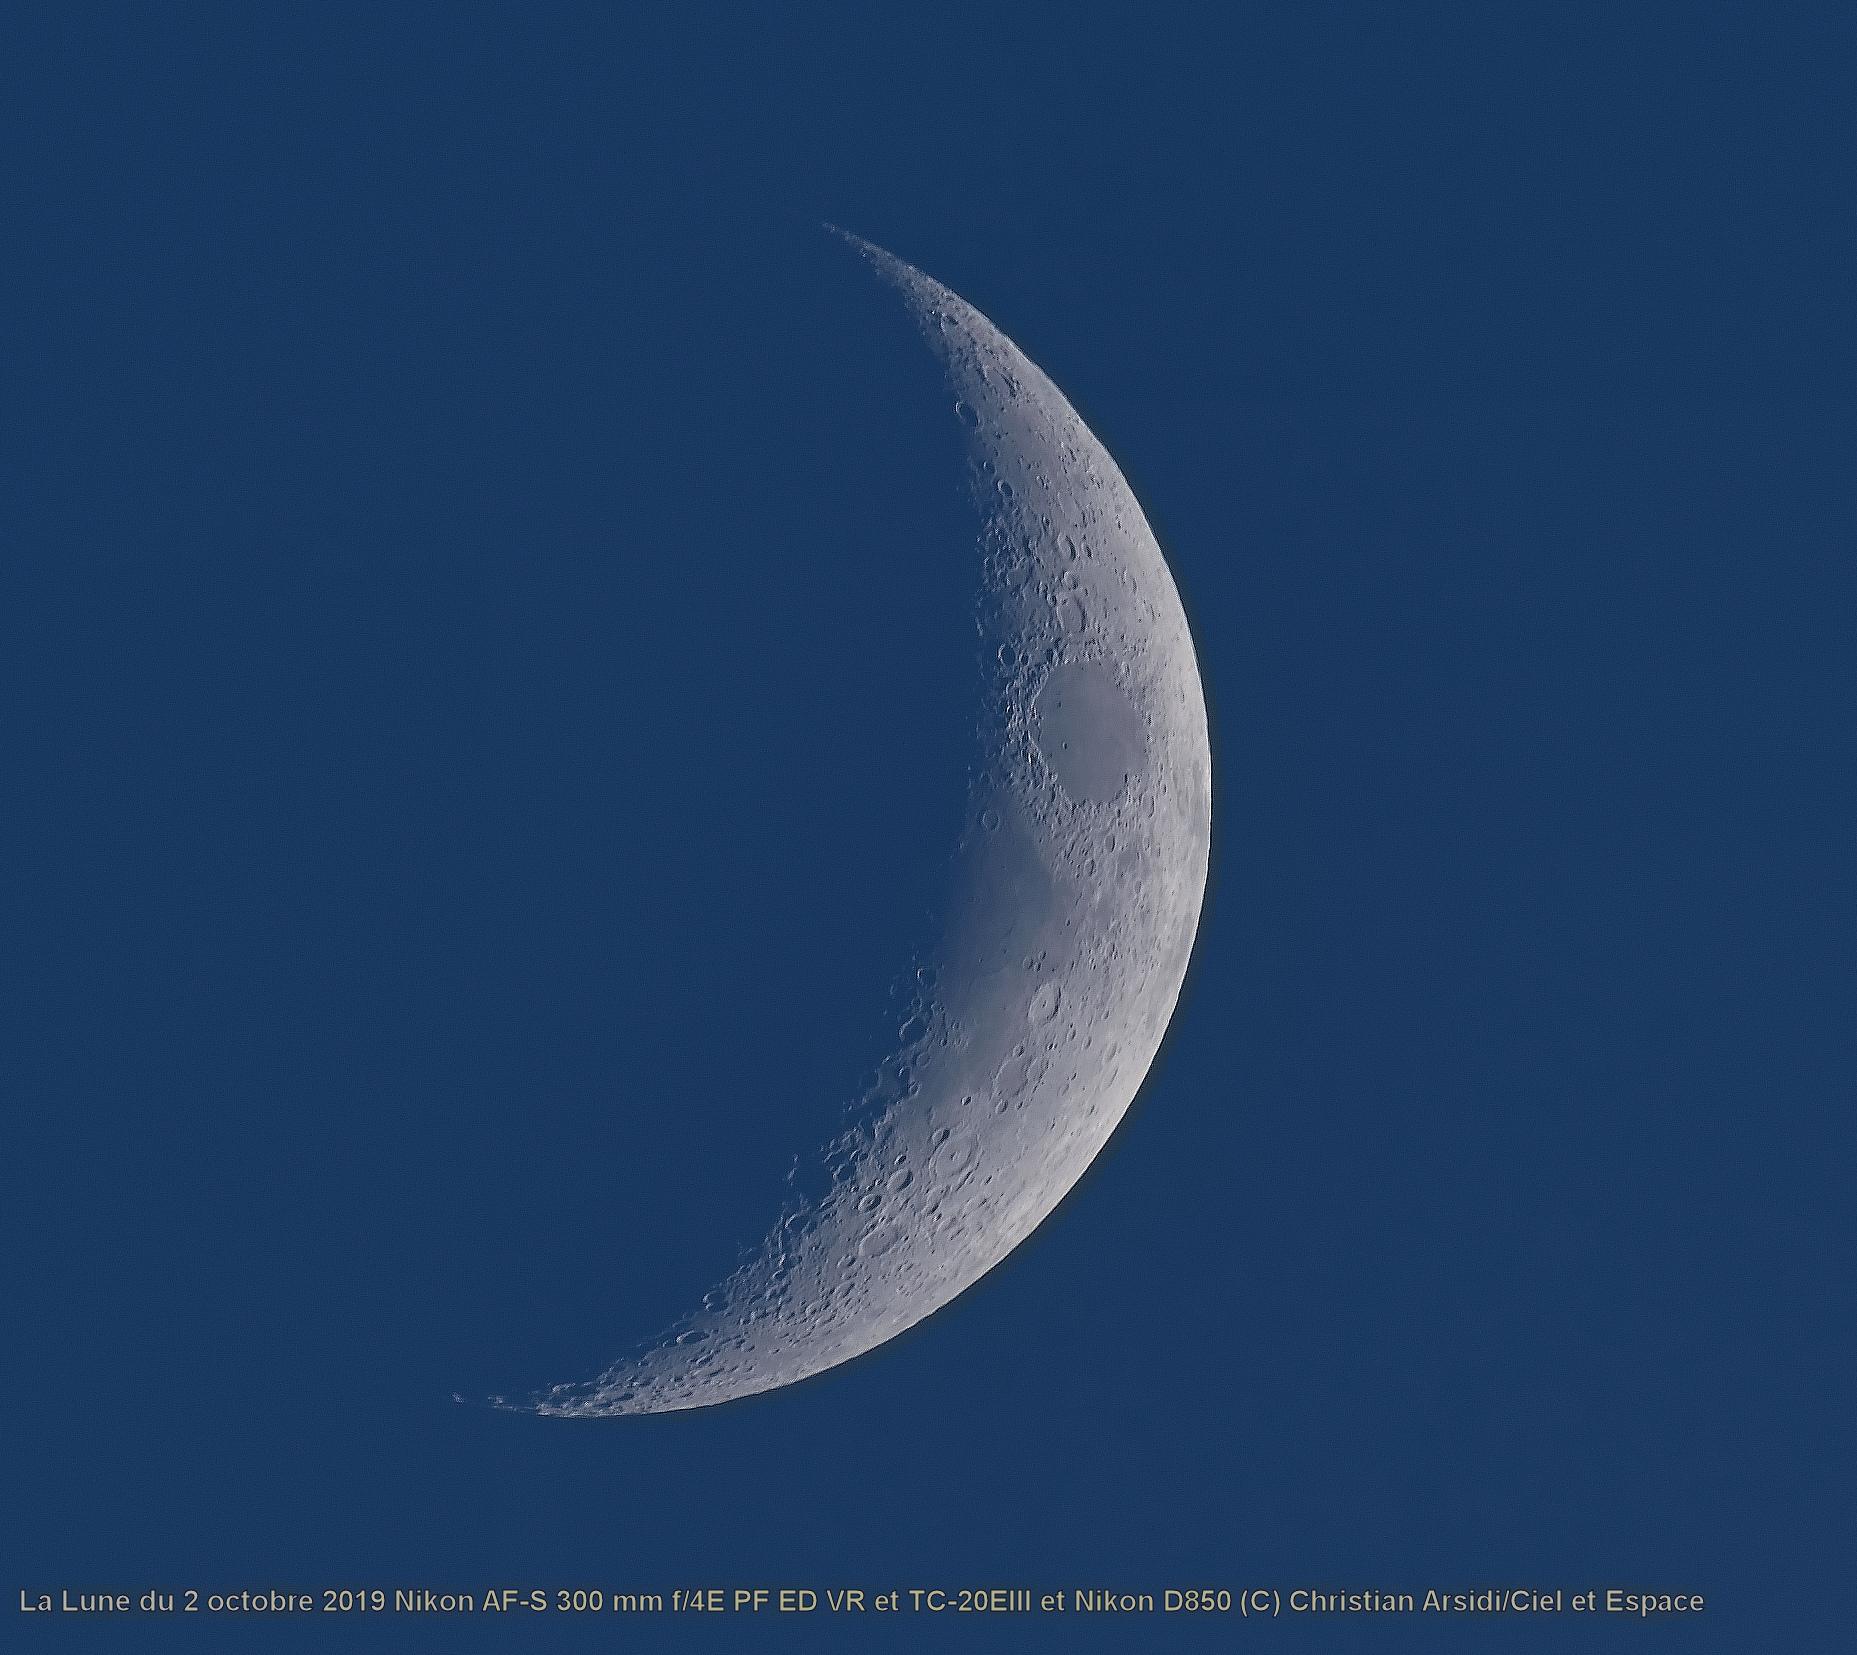 La Lune 25 images BV CA 100% BV2.jpg